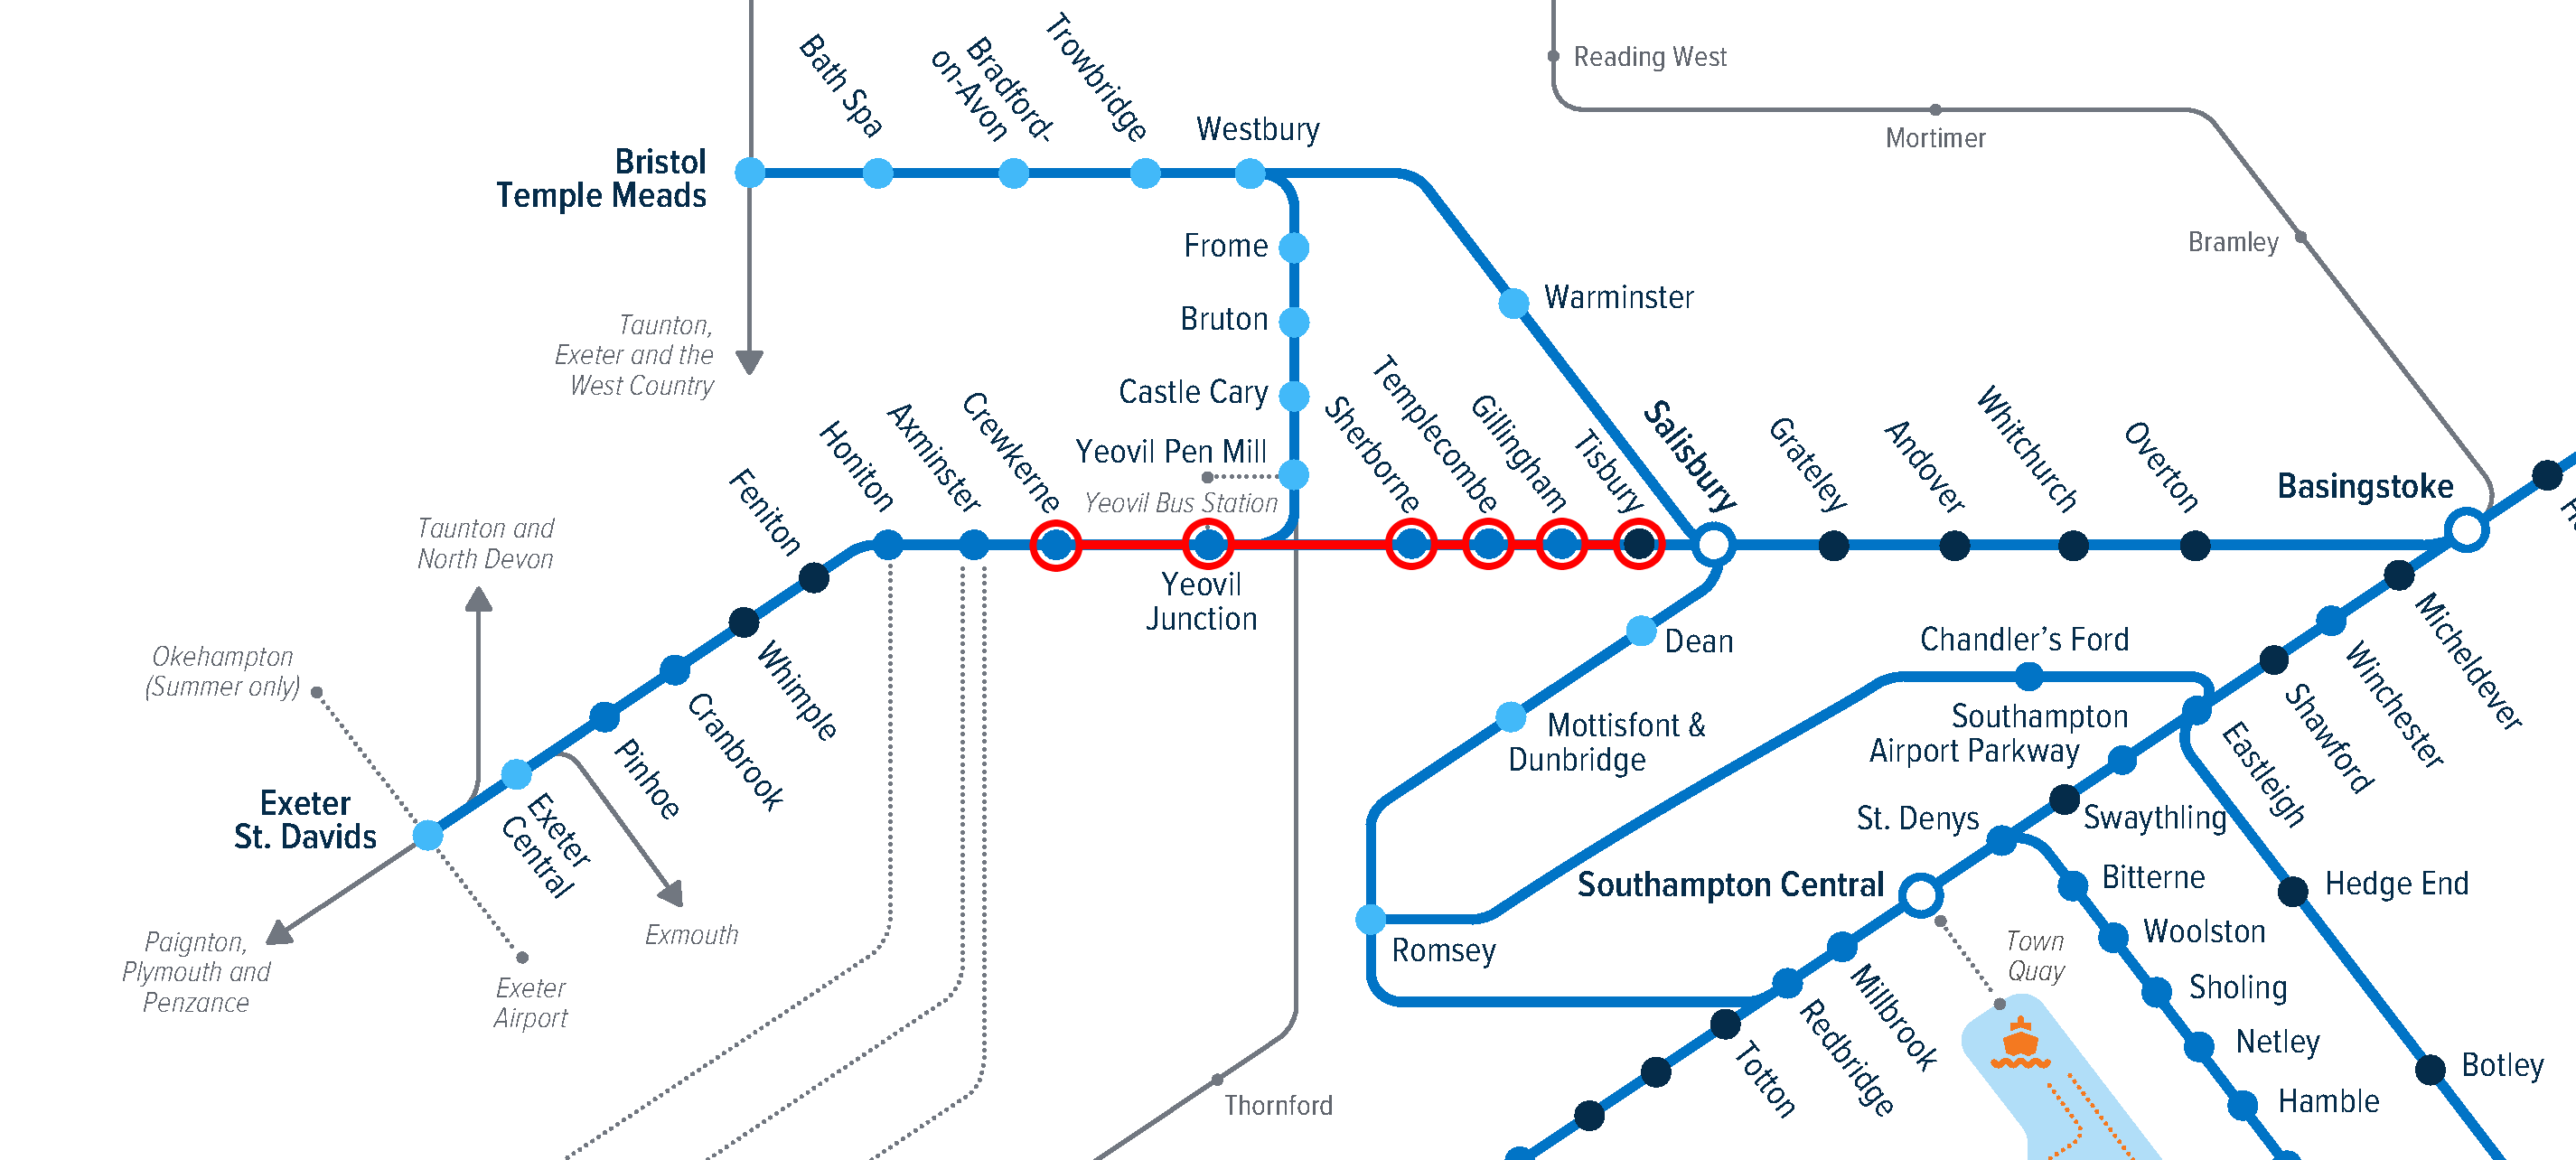 waterloo to richmond train timetable